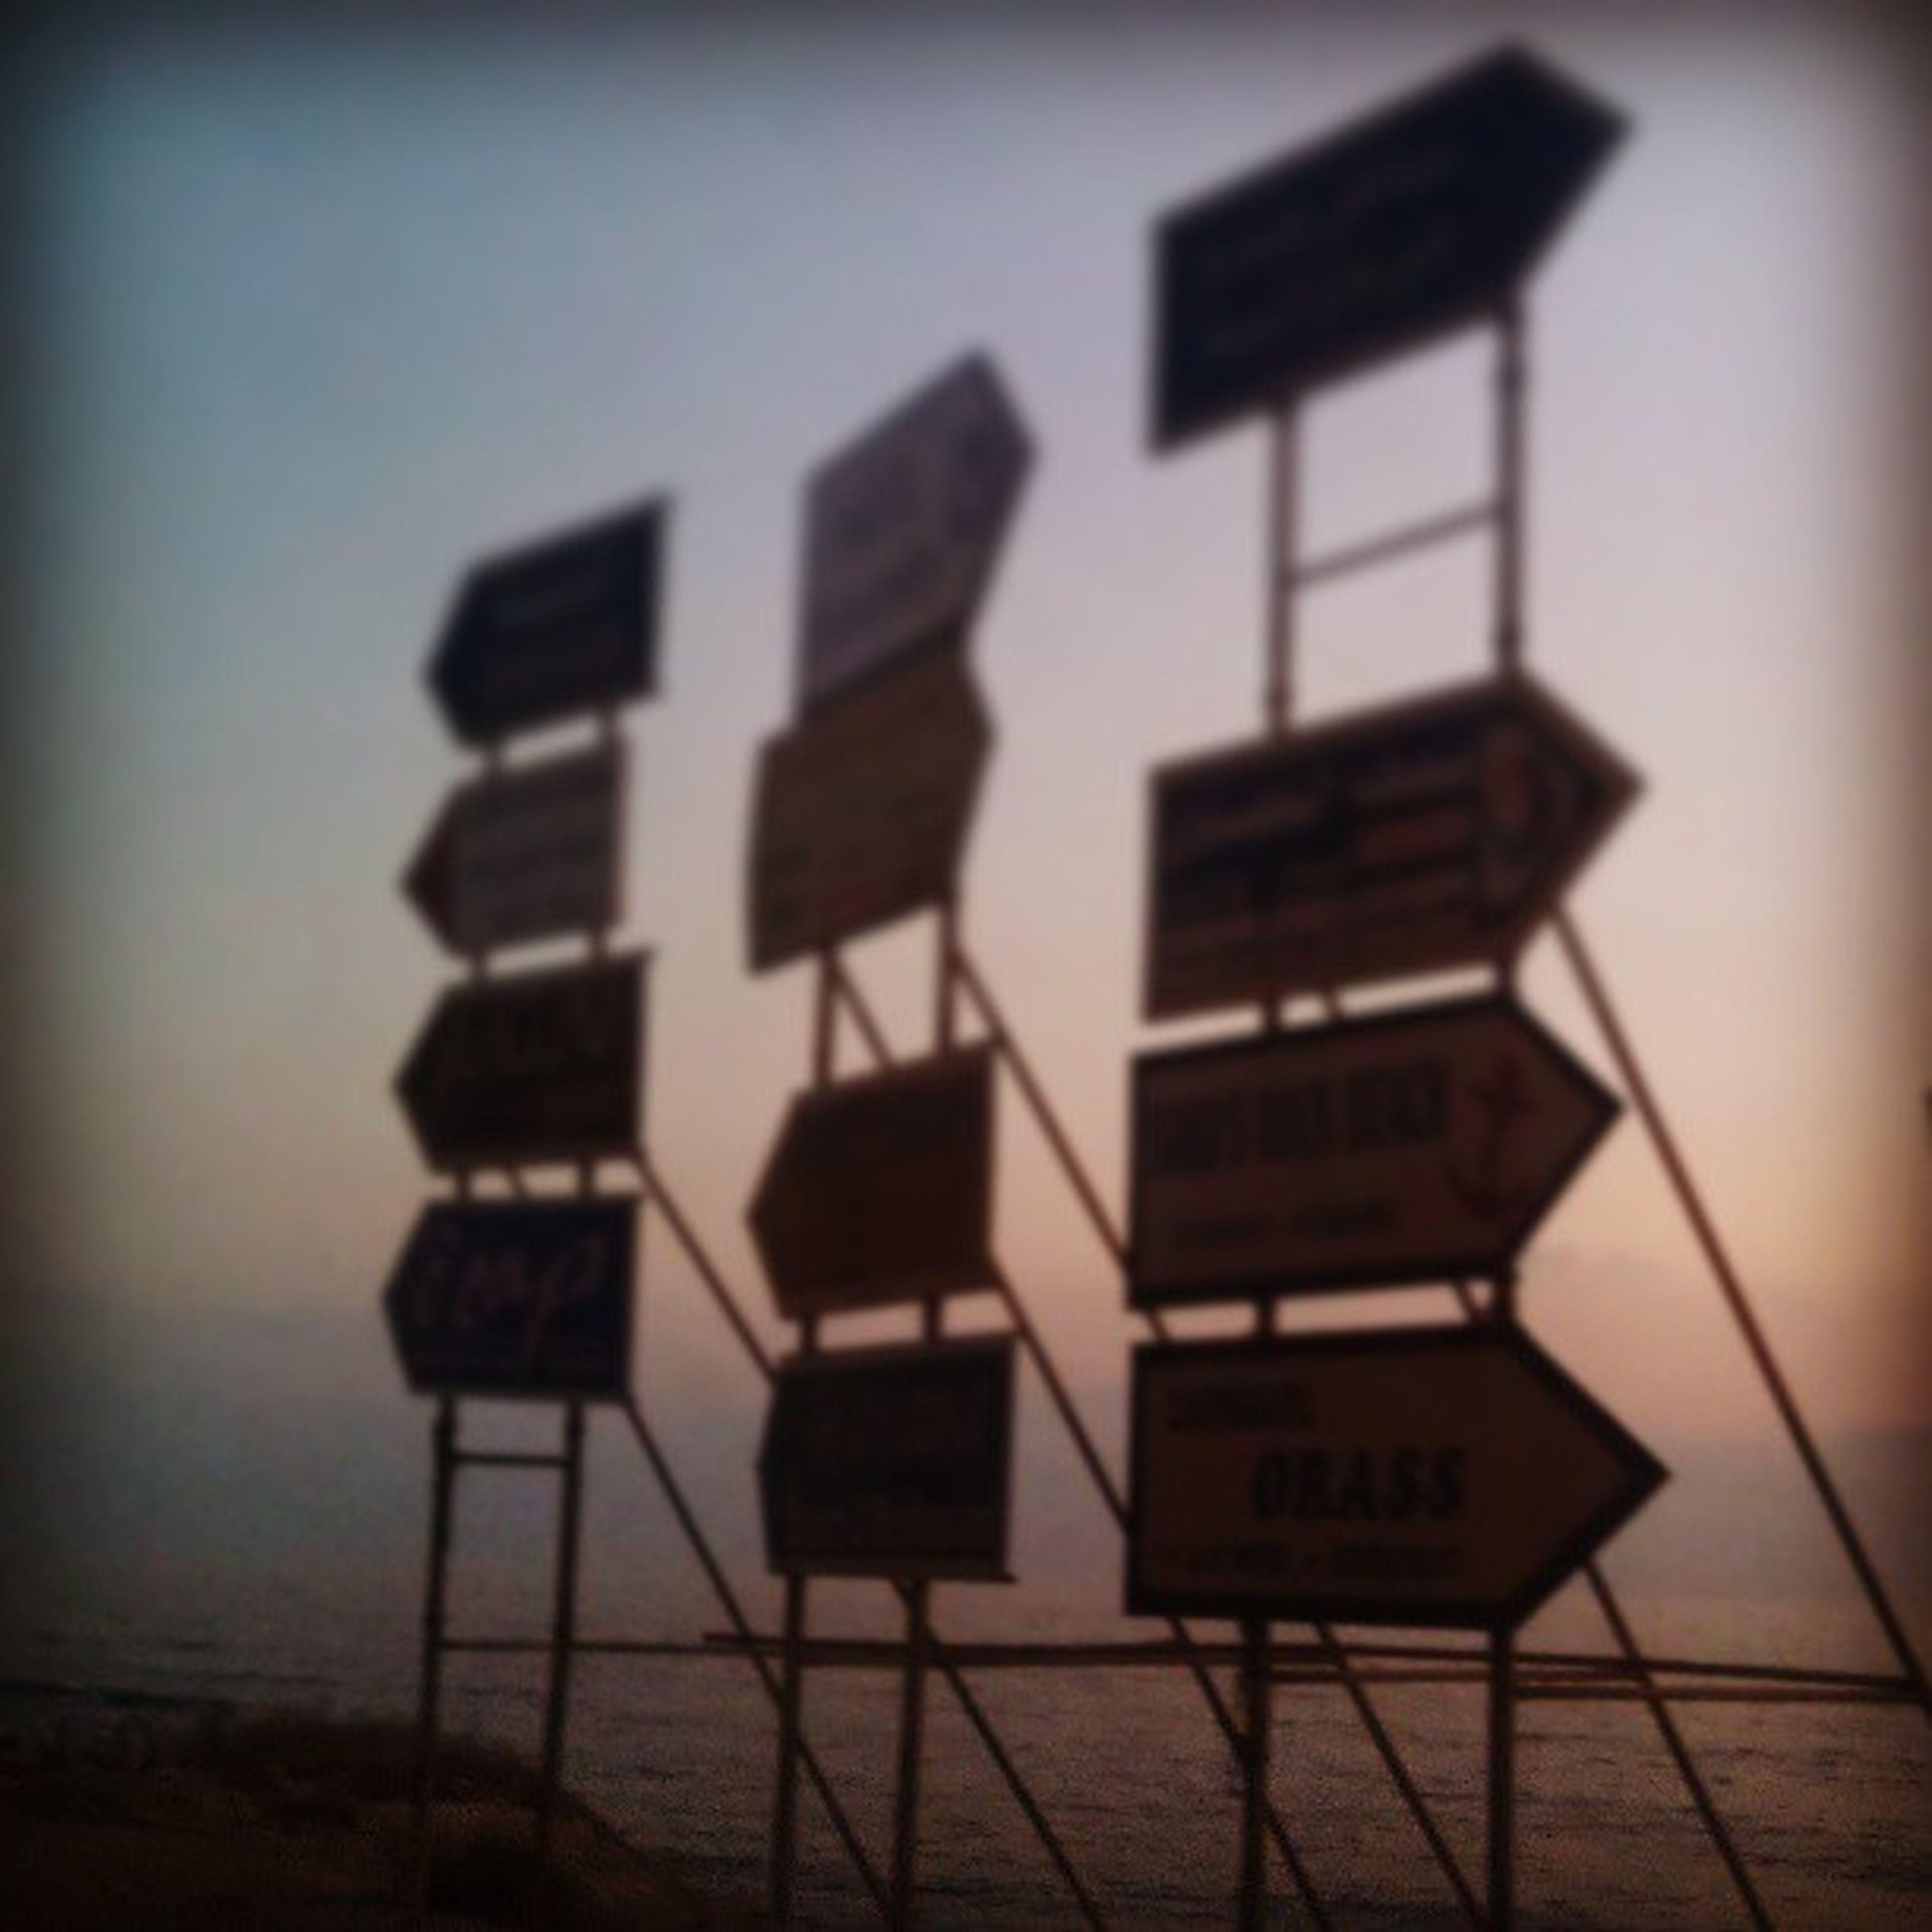 Directions Ways Direction Signs Roadsigns sunset throwback jadra saida Lebanon igerslebanon igersbeirut iglebanon